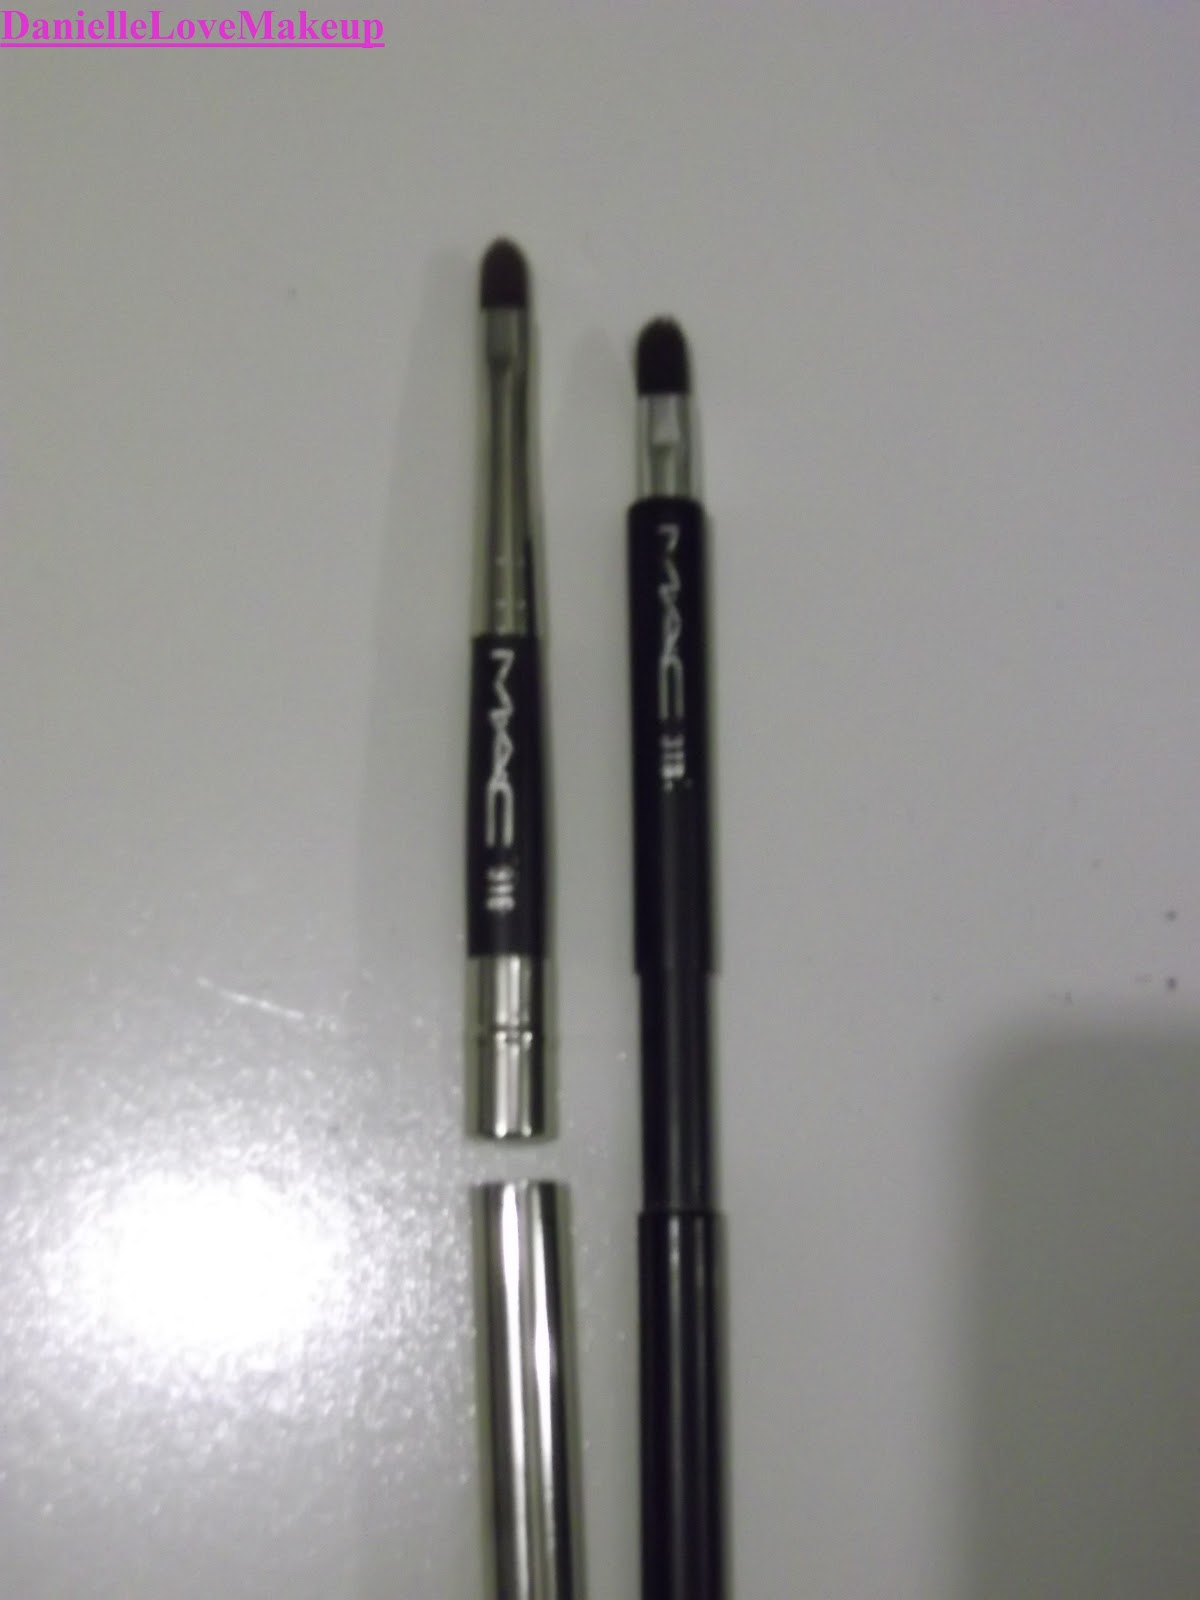 DanielleLoveMakeup: My Current MAC Brush Collection